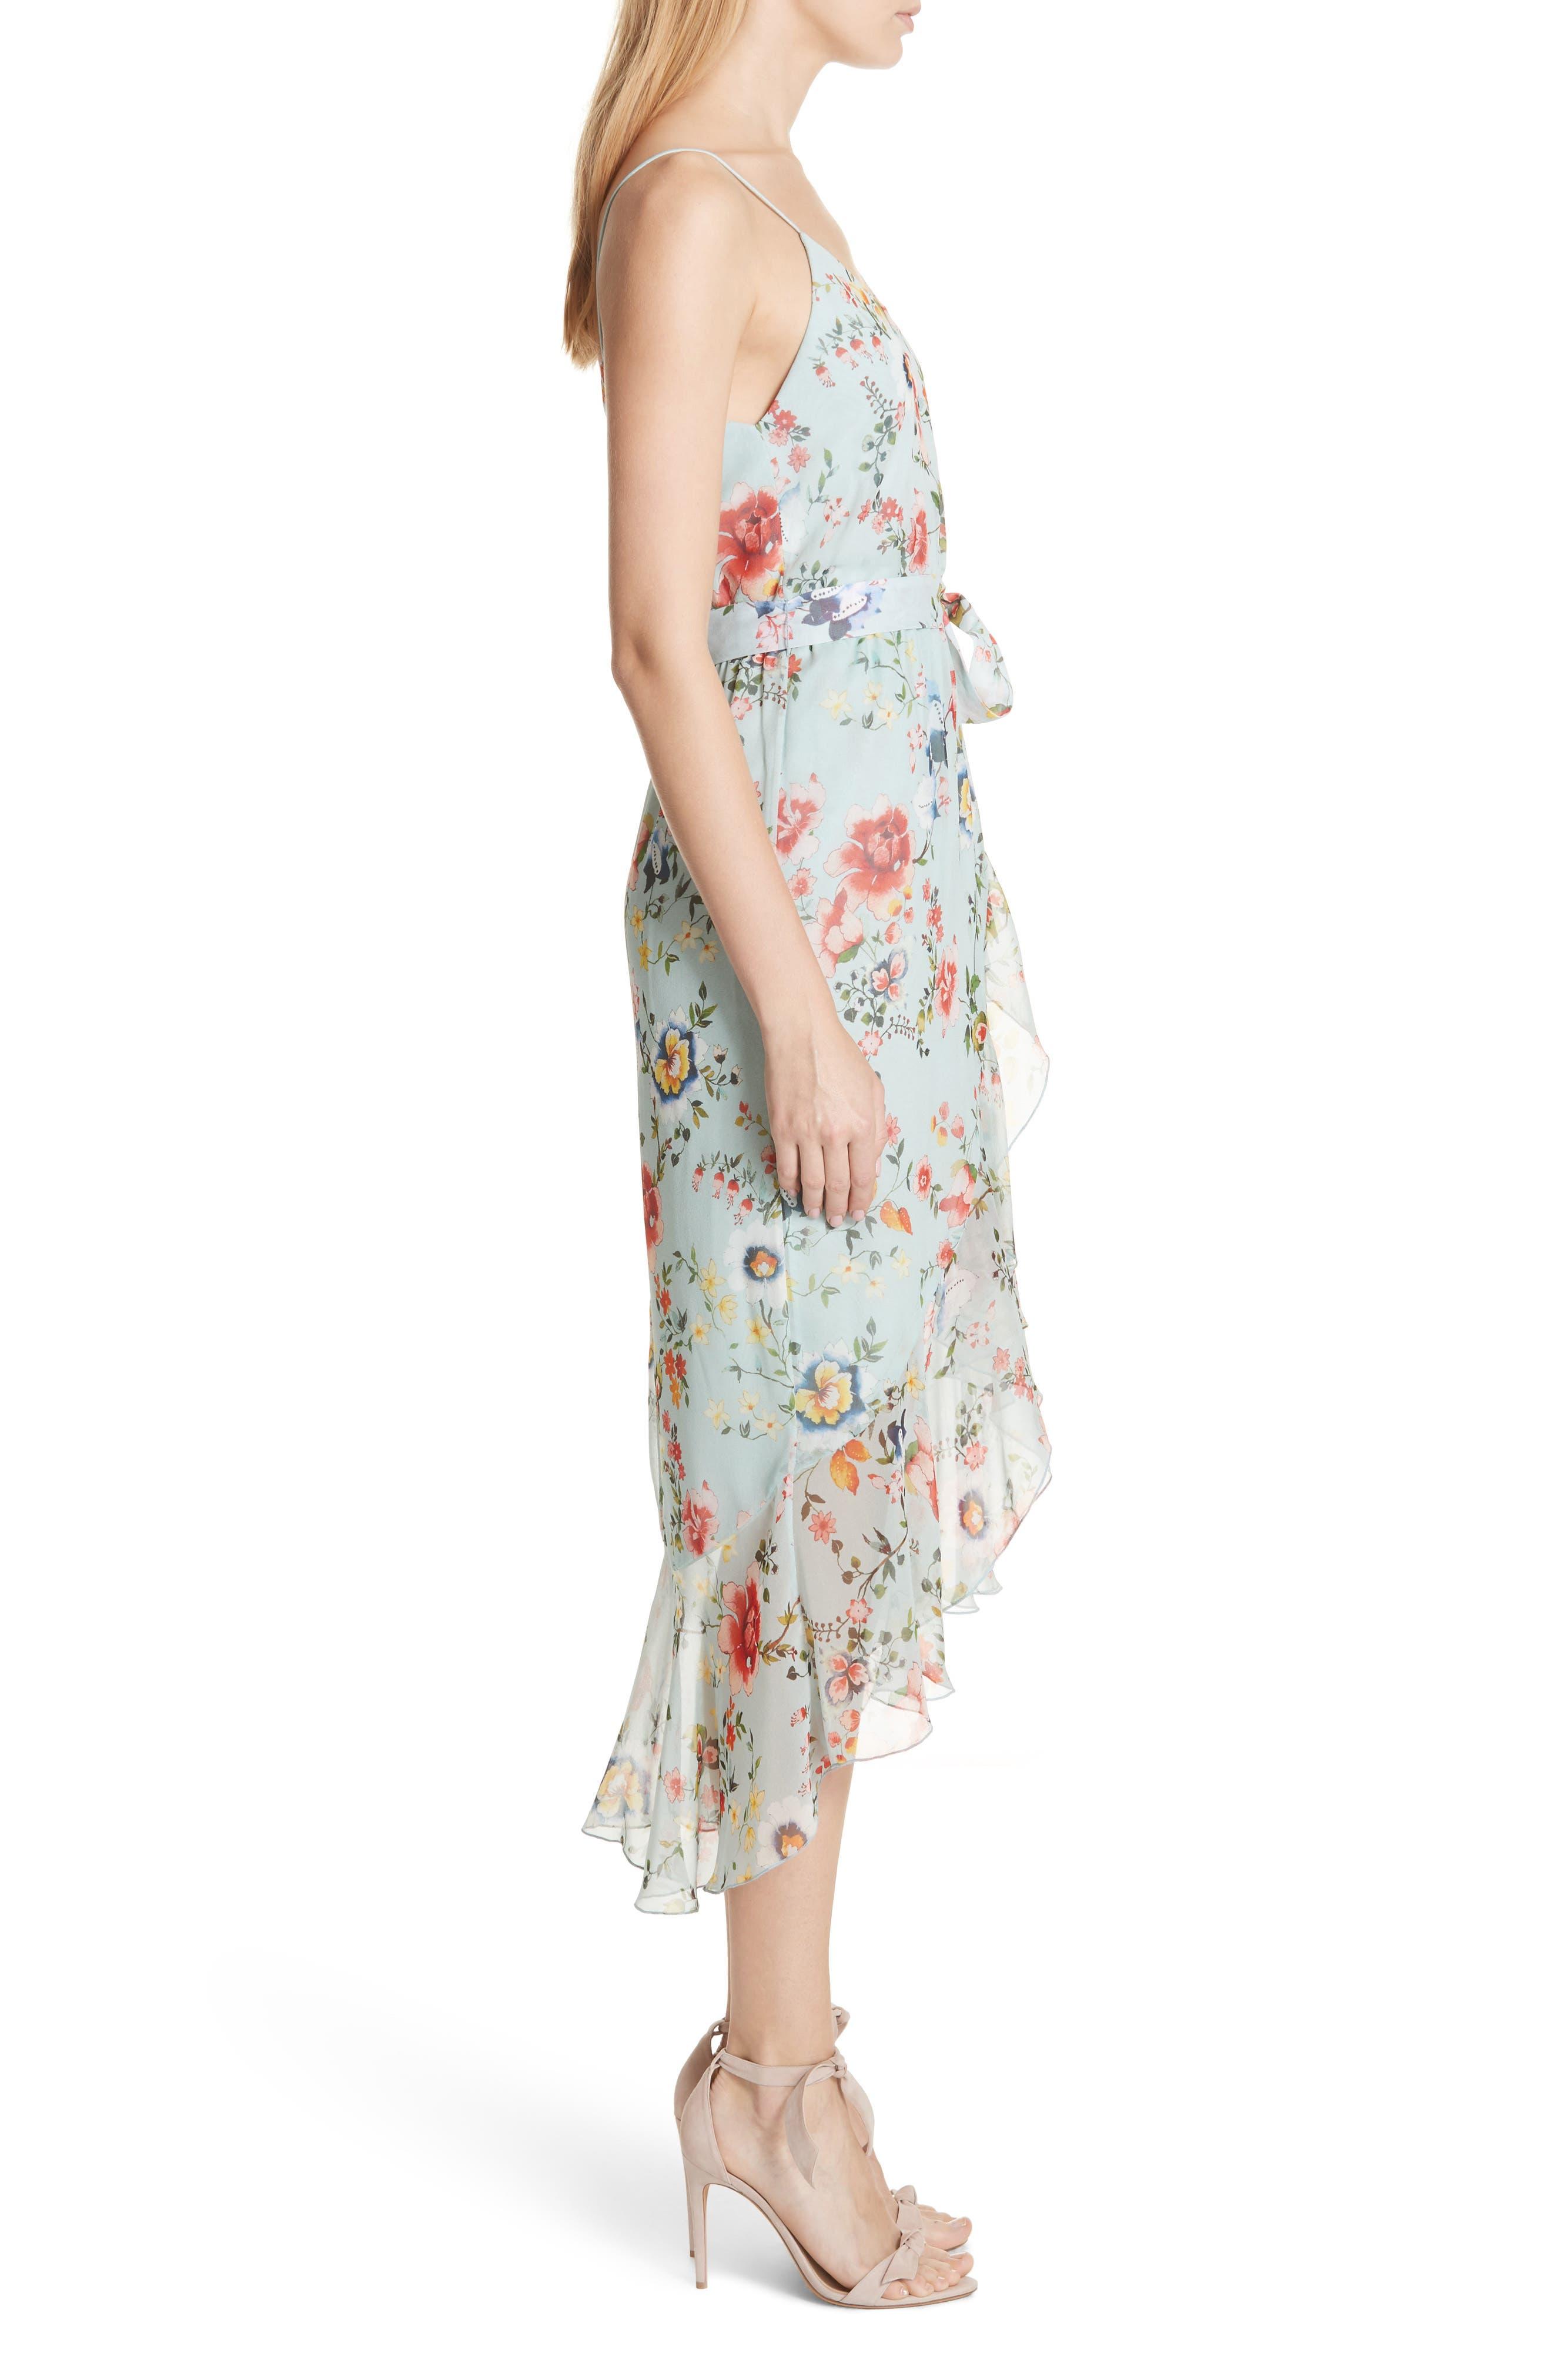 Mable Floral Silk Midi Dress,                             Alternate thumbnail 3, color,                             Floral Soiree-Dusty Aqua